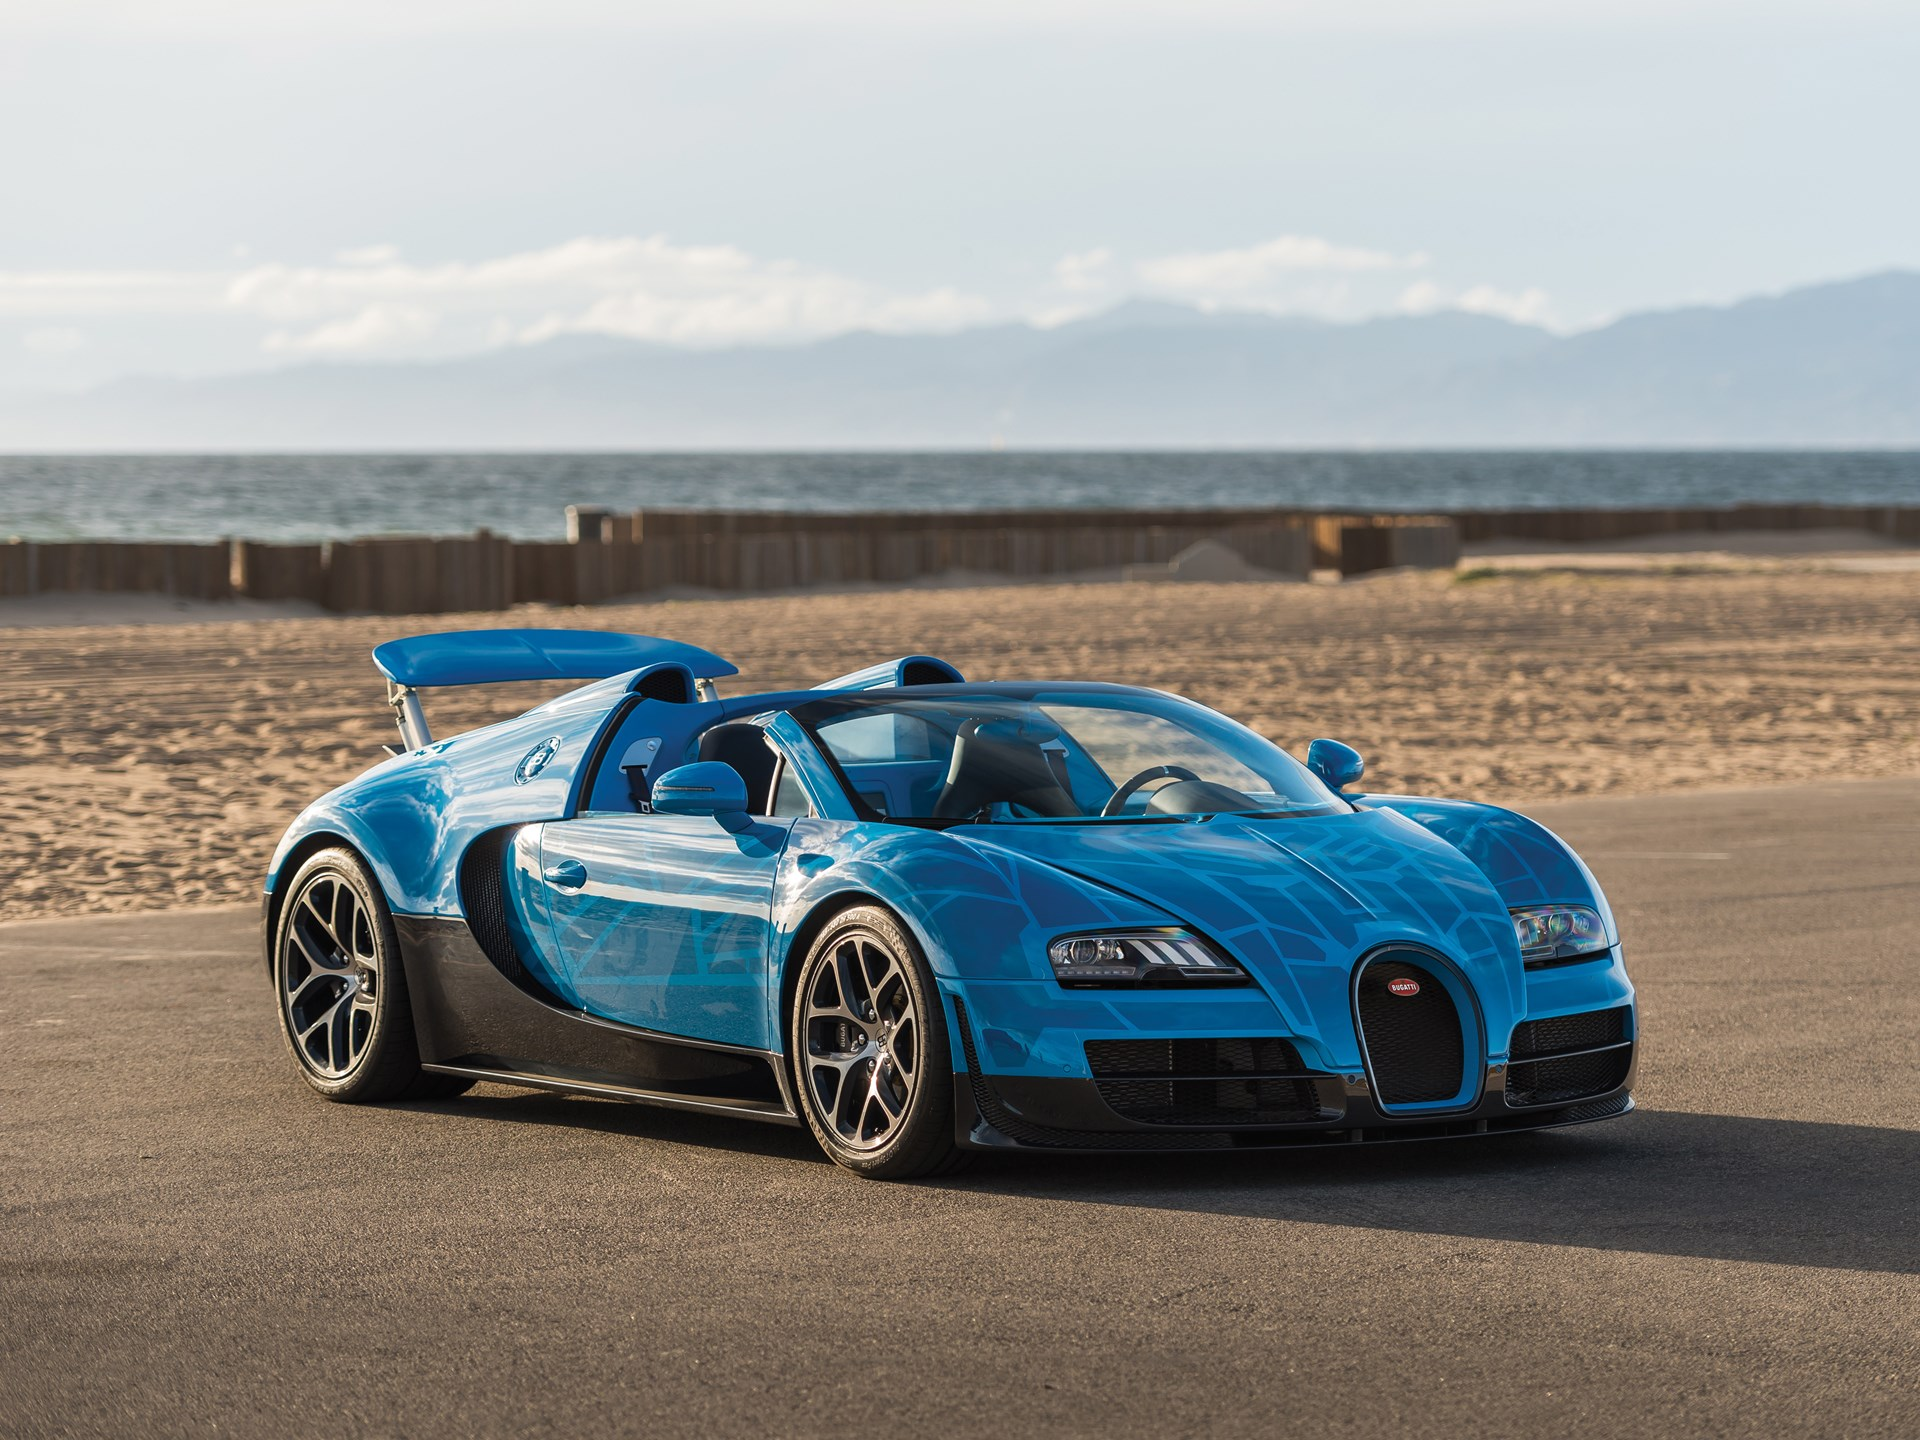 Bugatti Veyron Price 2015 >> Rm Sotheby S 2015 Bugatti Veyron 16 4 Grand Sport Vitesse